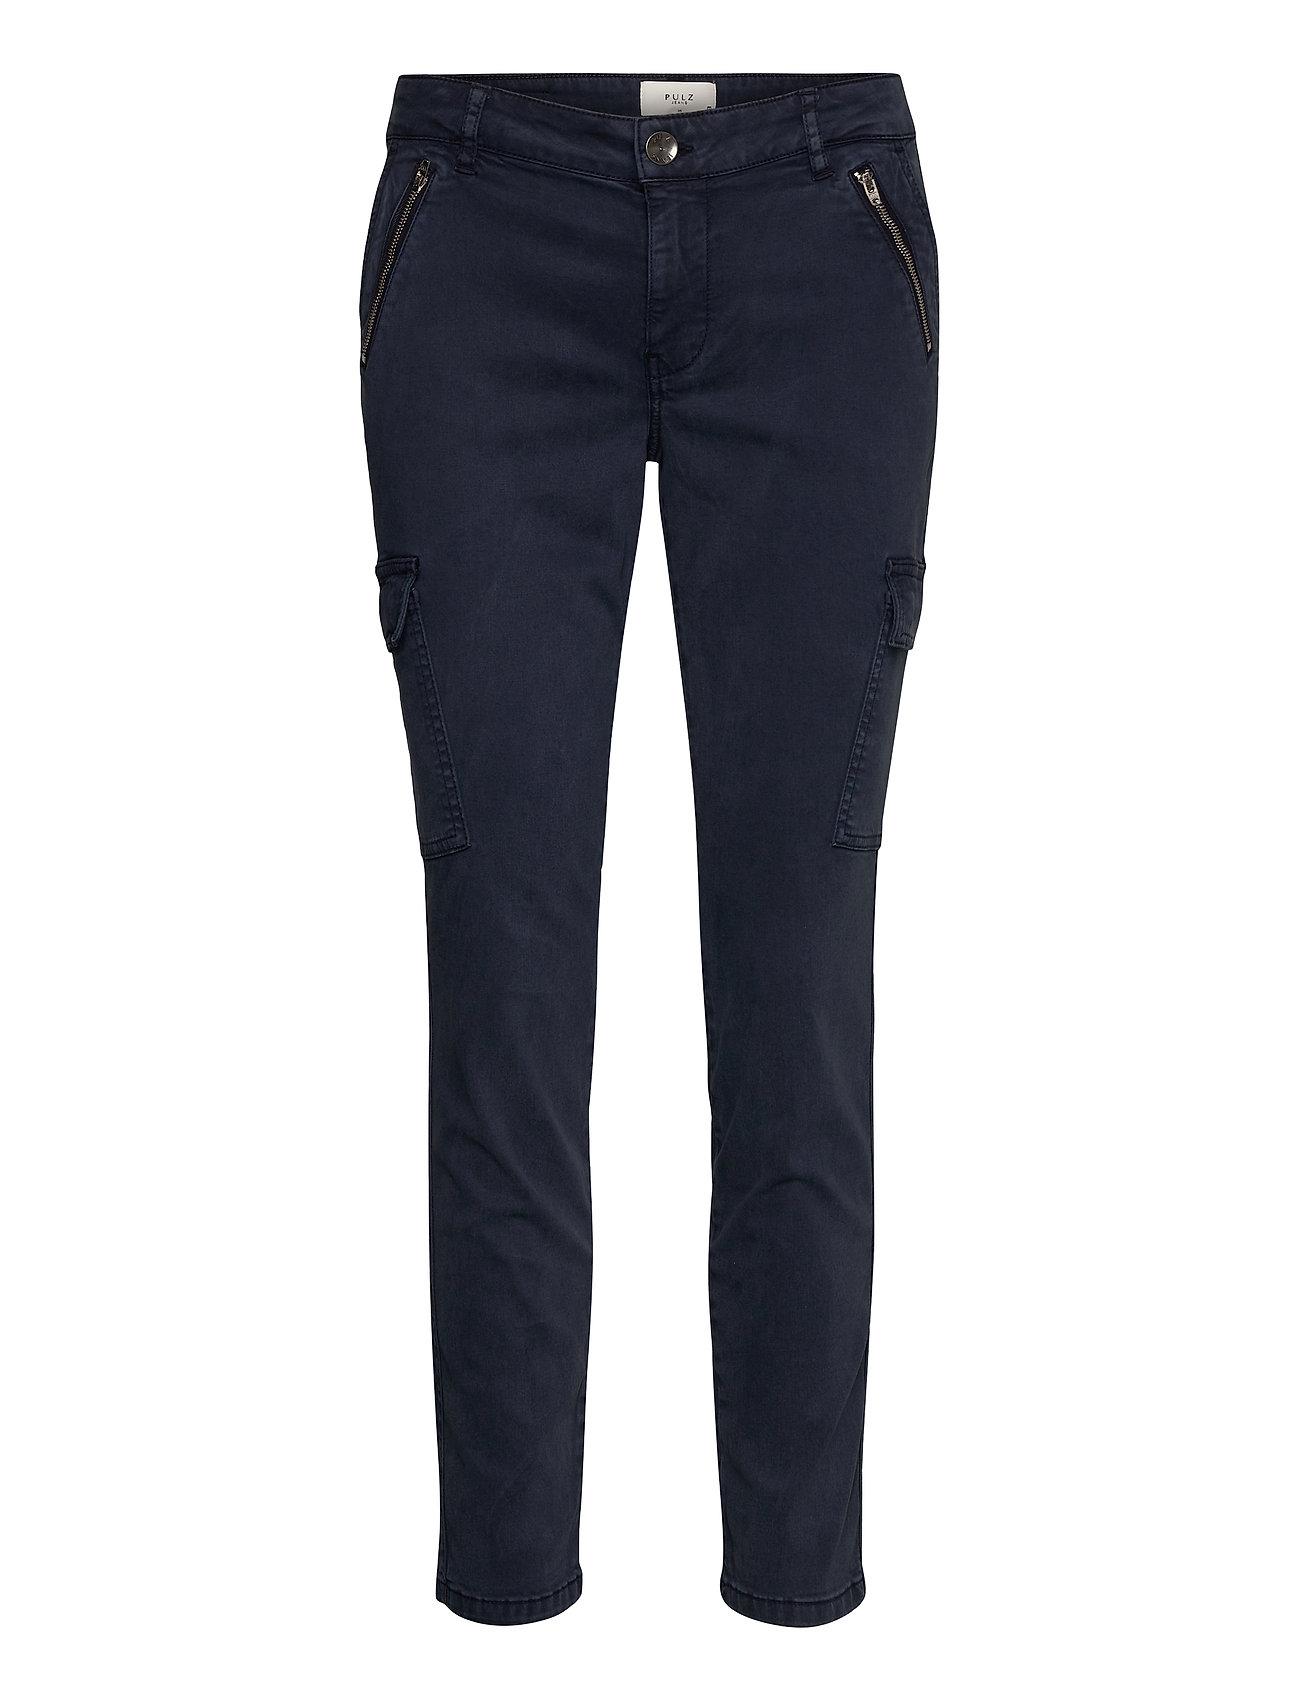 Image of Pxelva Pant Bukser Med Lige Ben Blå Pulz Jeans (3435717901)